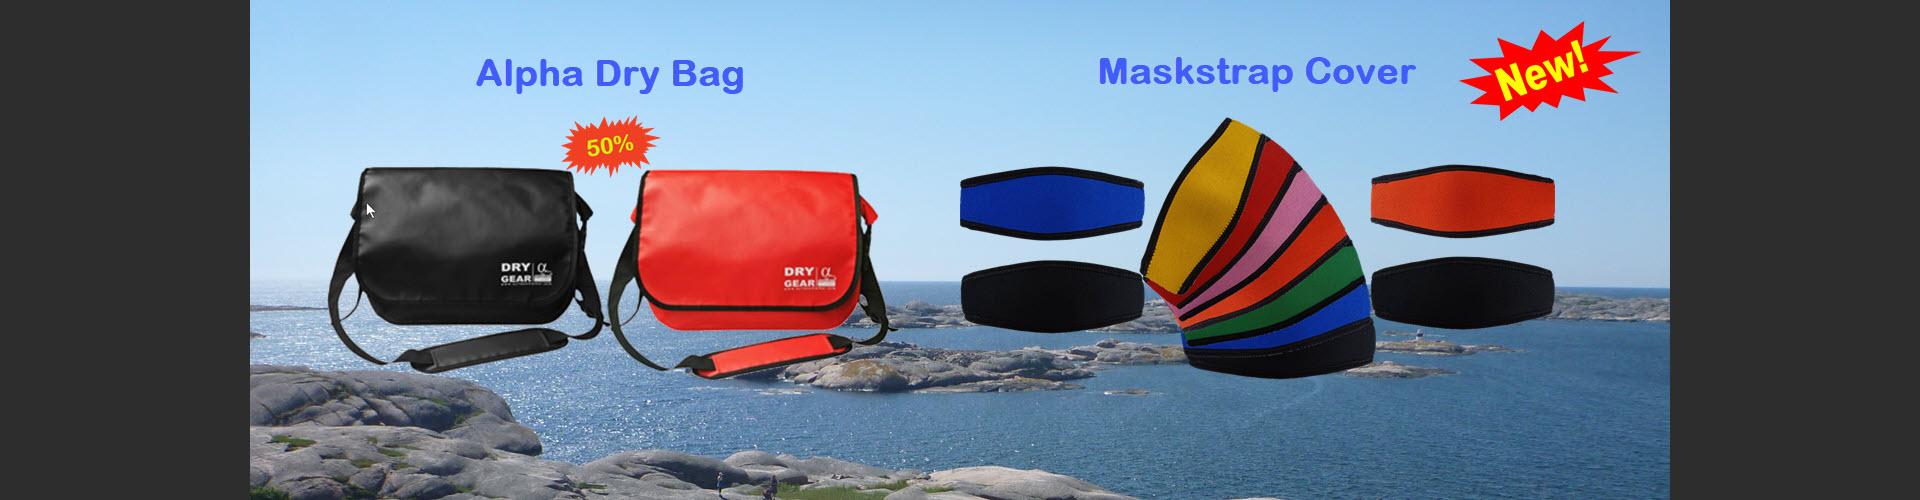 Alpha Bag and Maskstrap Cover